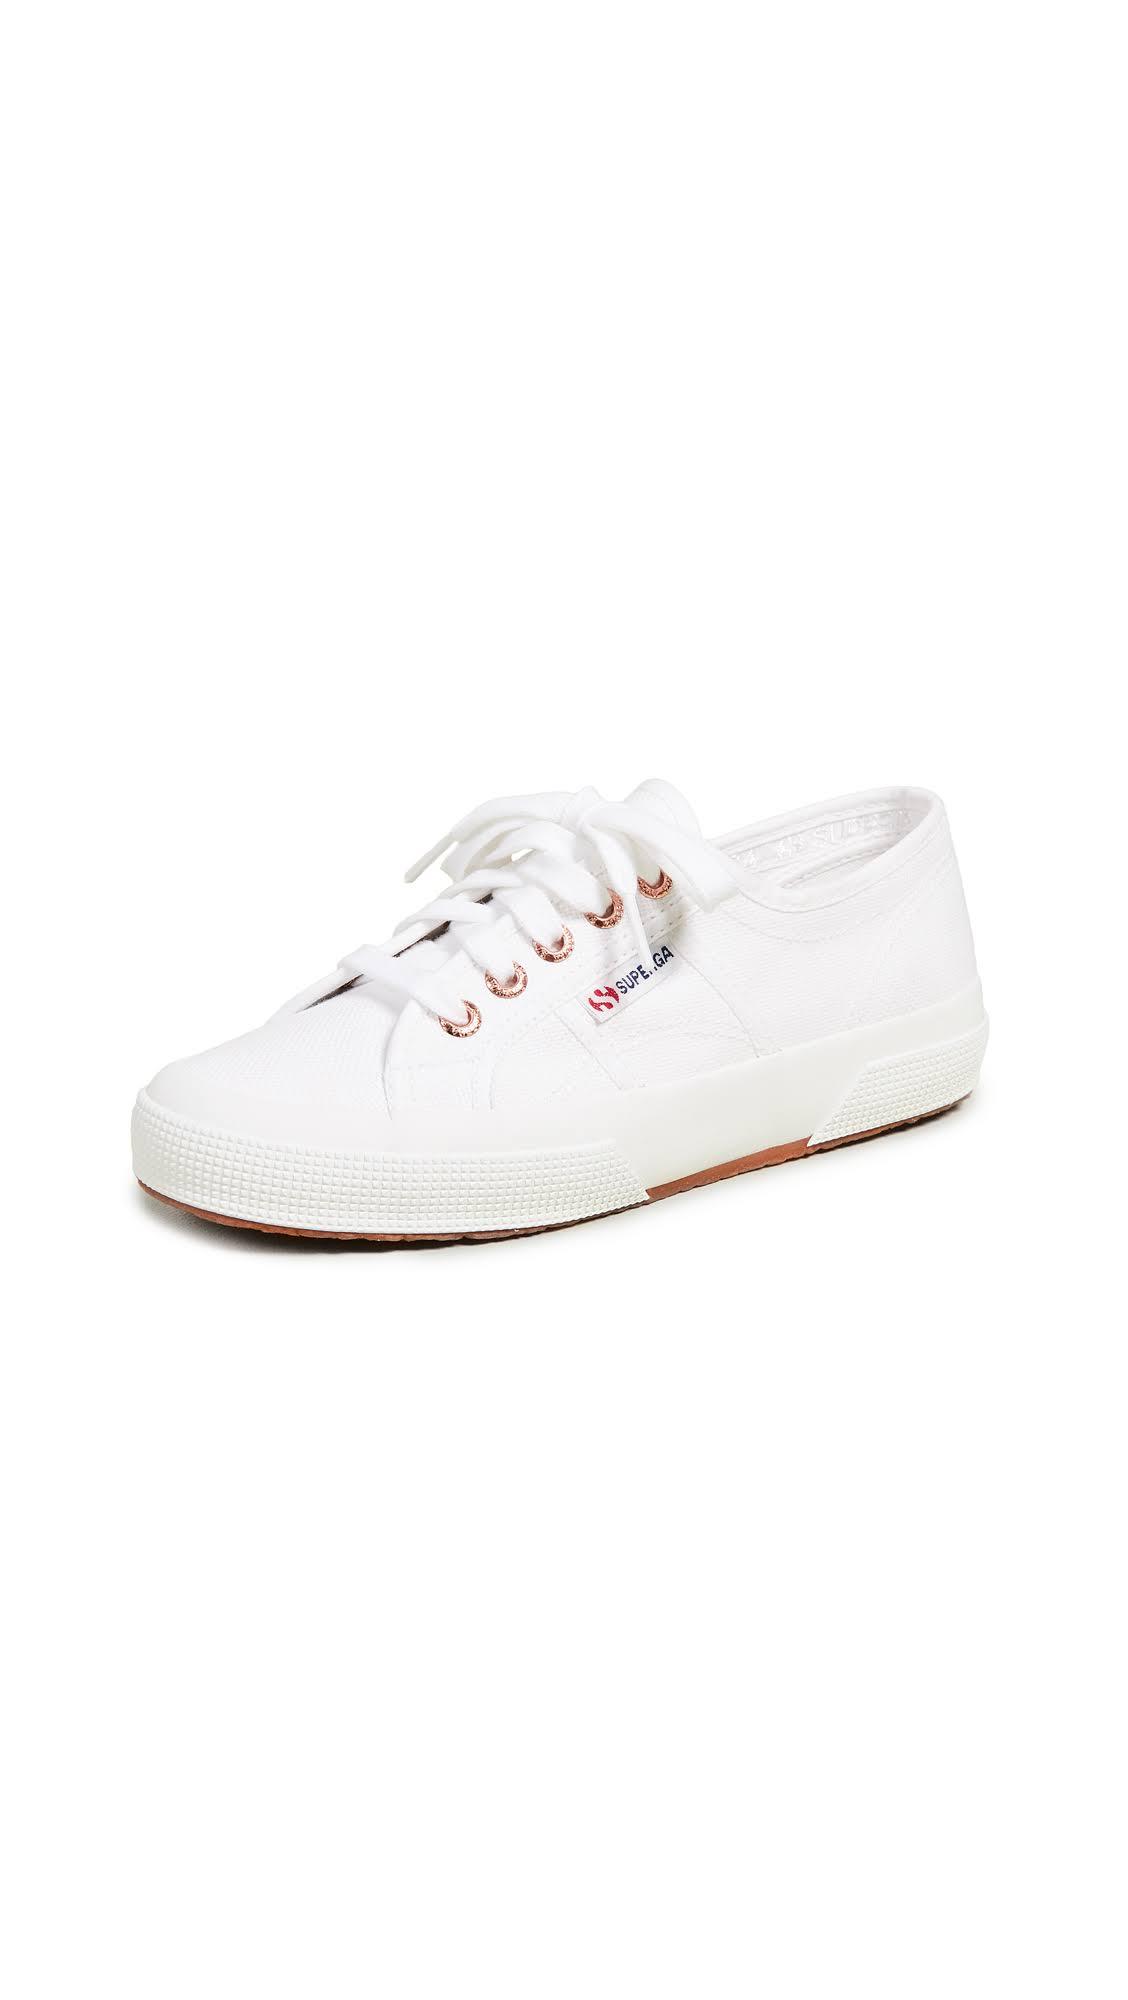 2750 Sneakers Cotu Witroze Superga Classic cLq5AjR34S